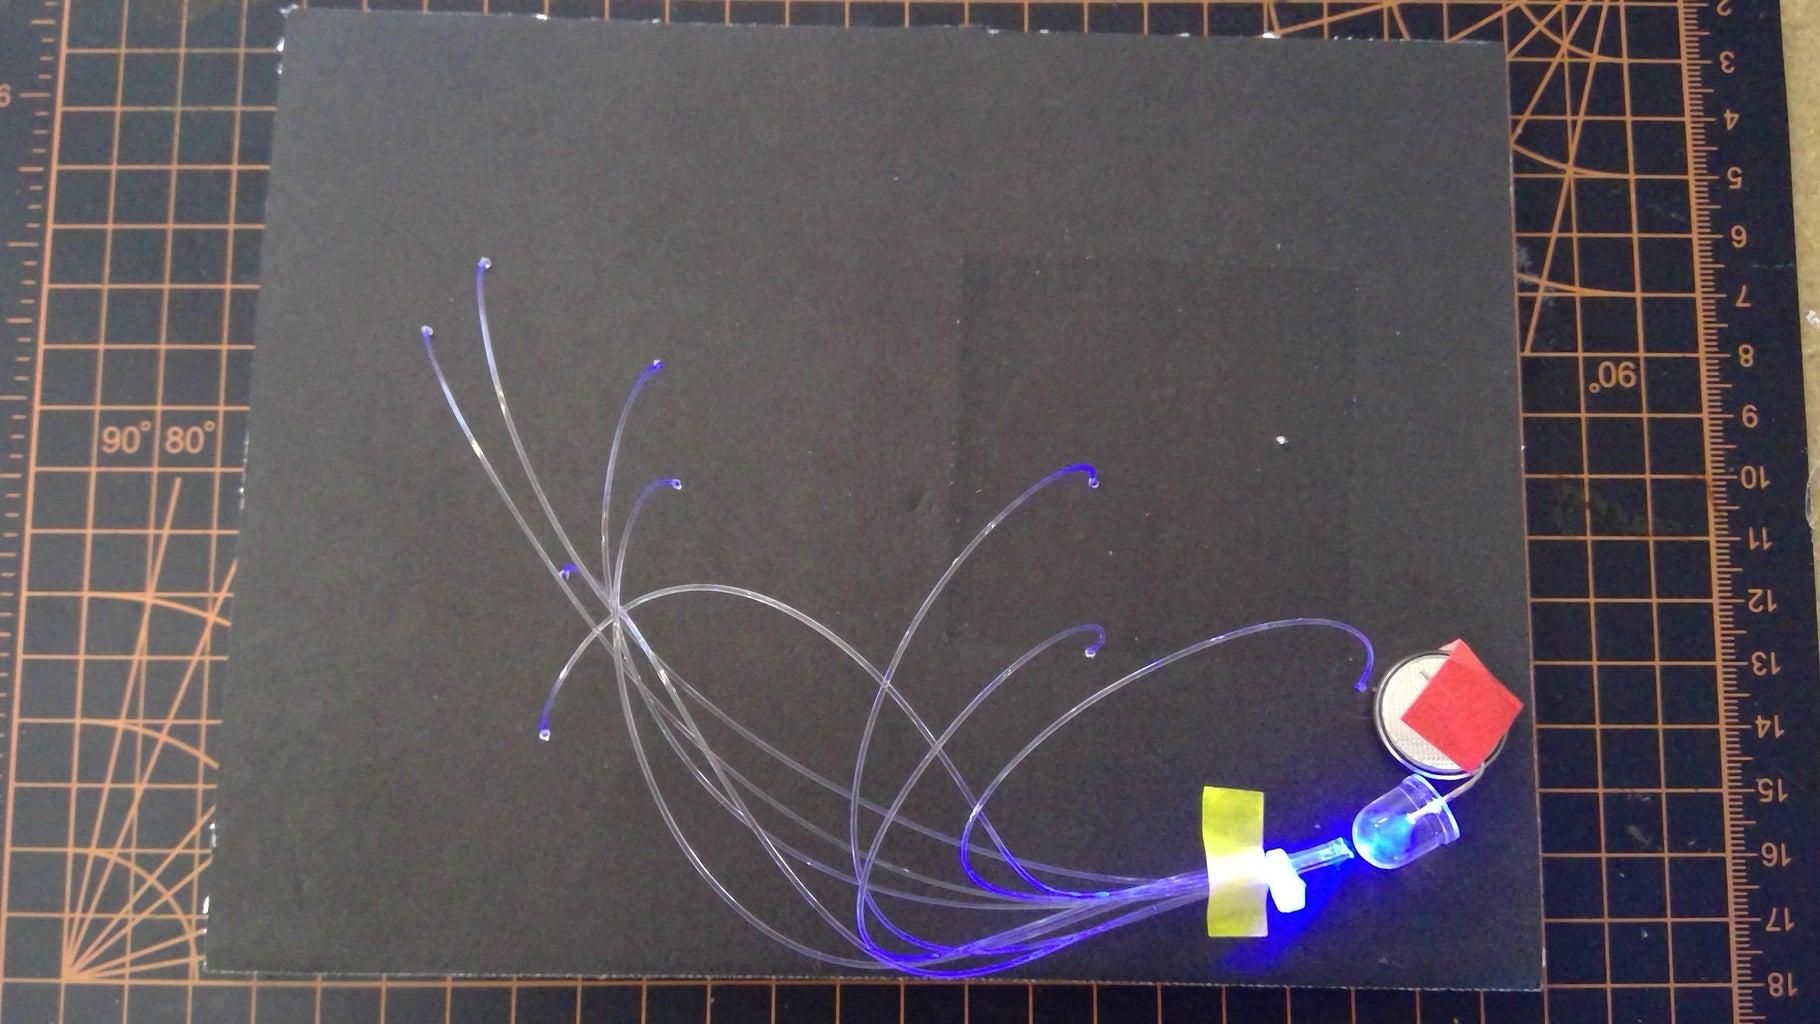 Insert the Fiber Optic Cables & LED